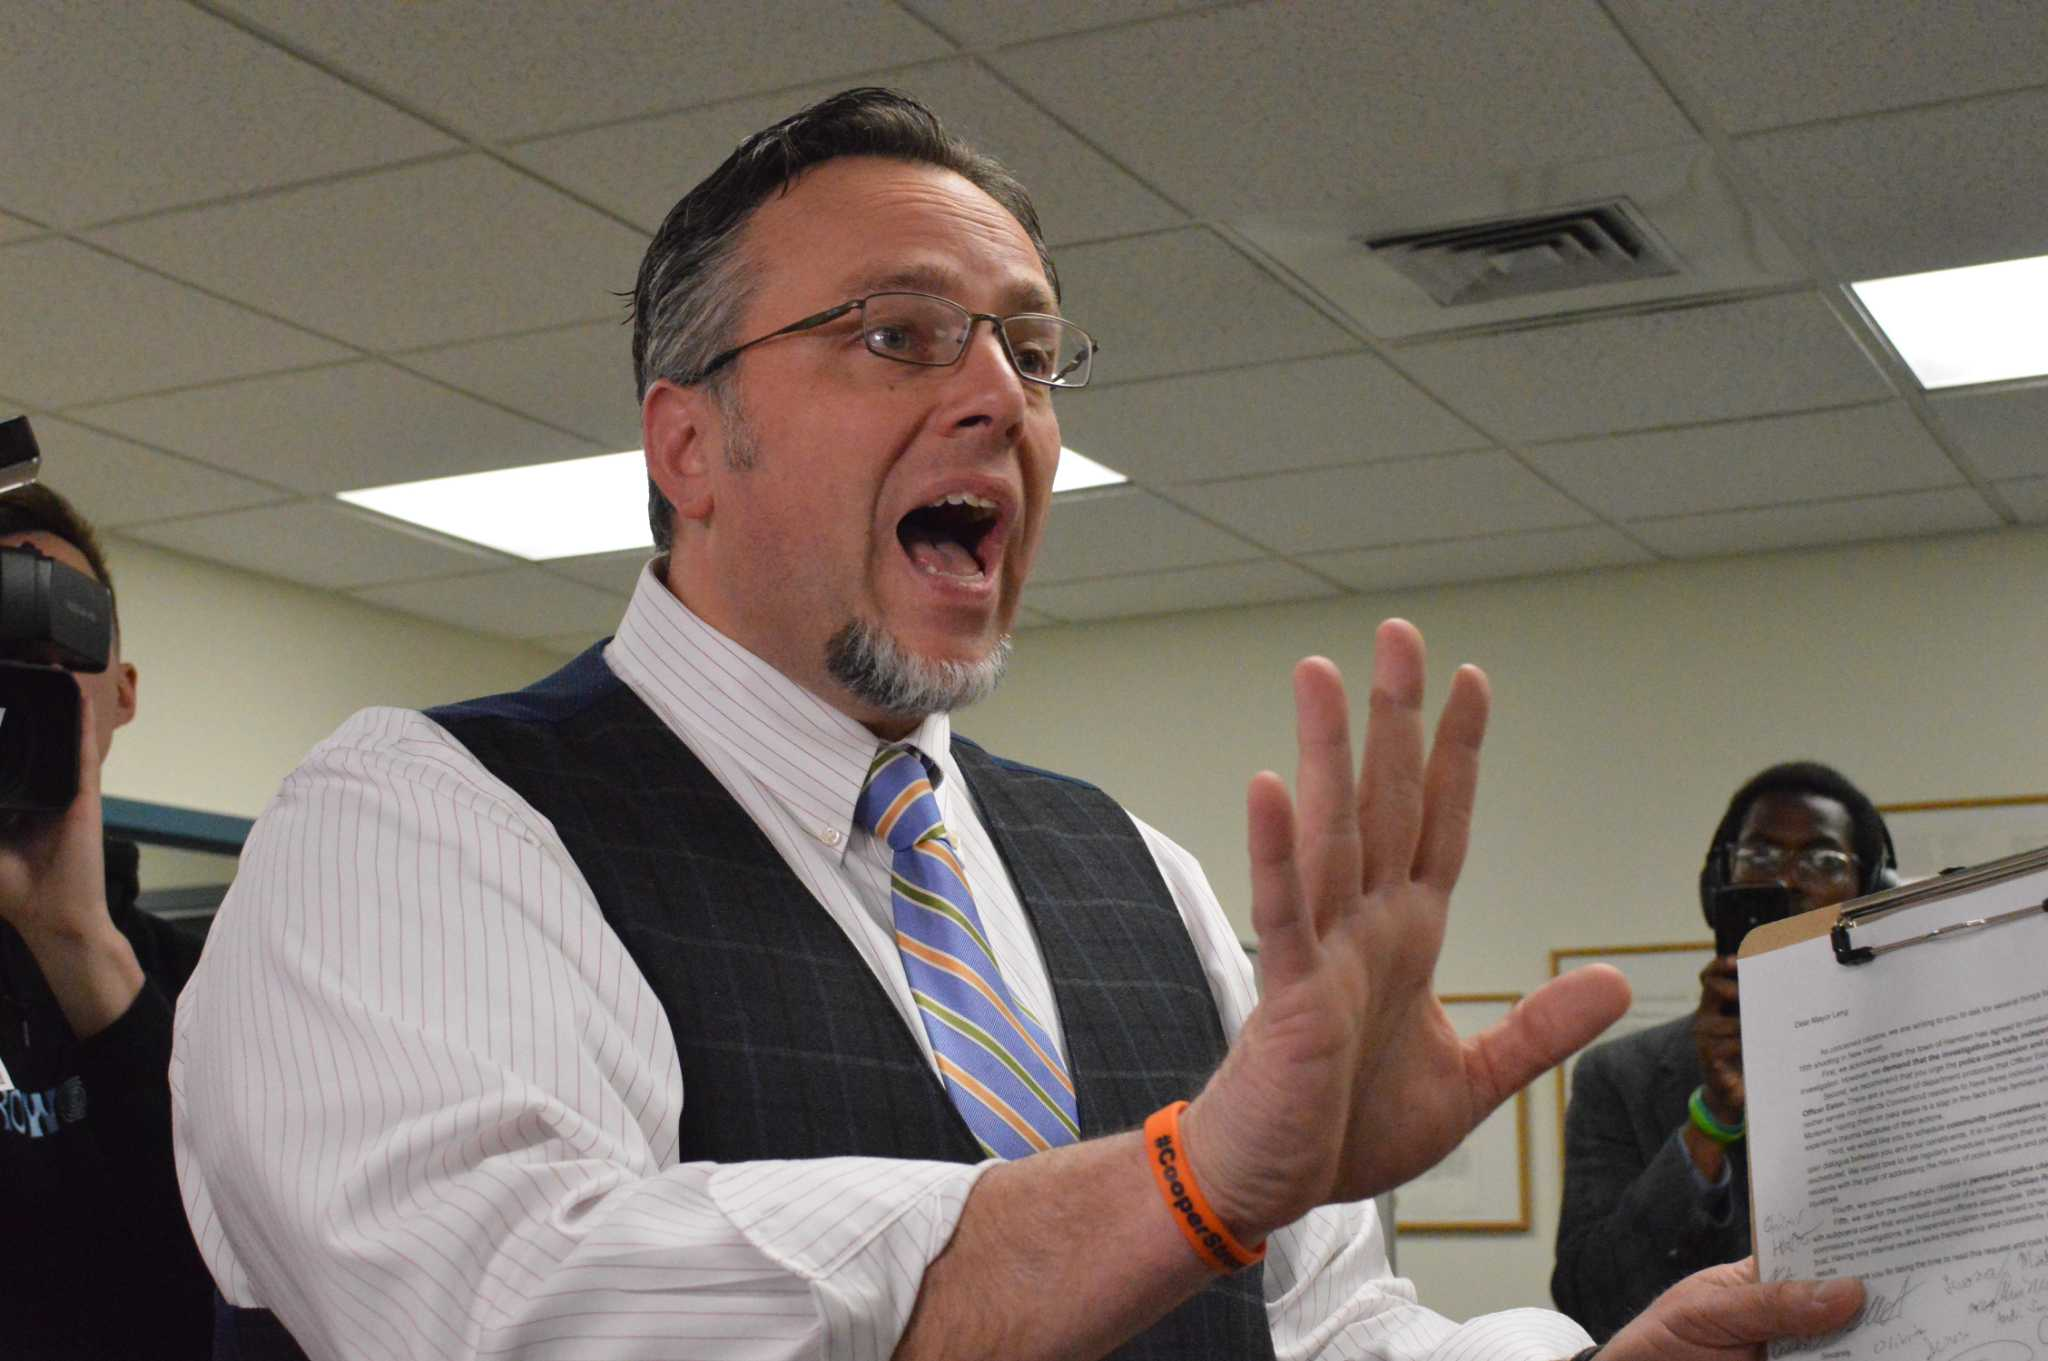 Hamden mayor apologizes for liking Chuck Woolery's anti-Obama tweet